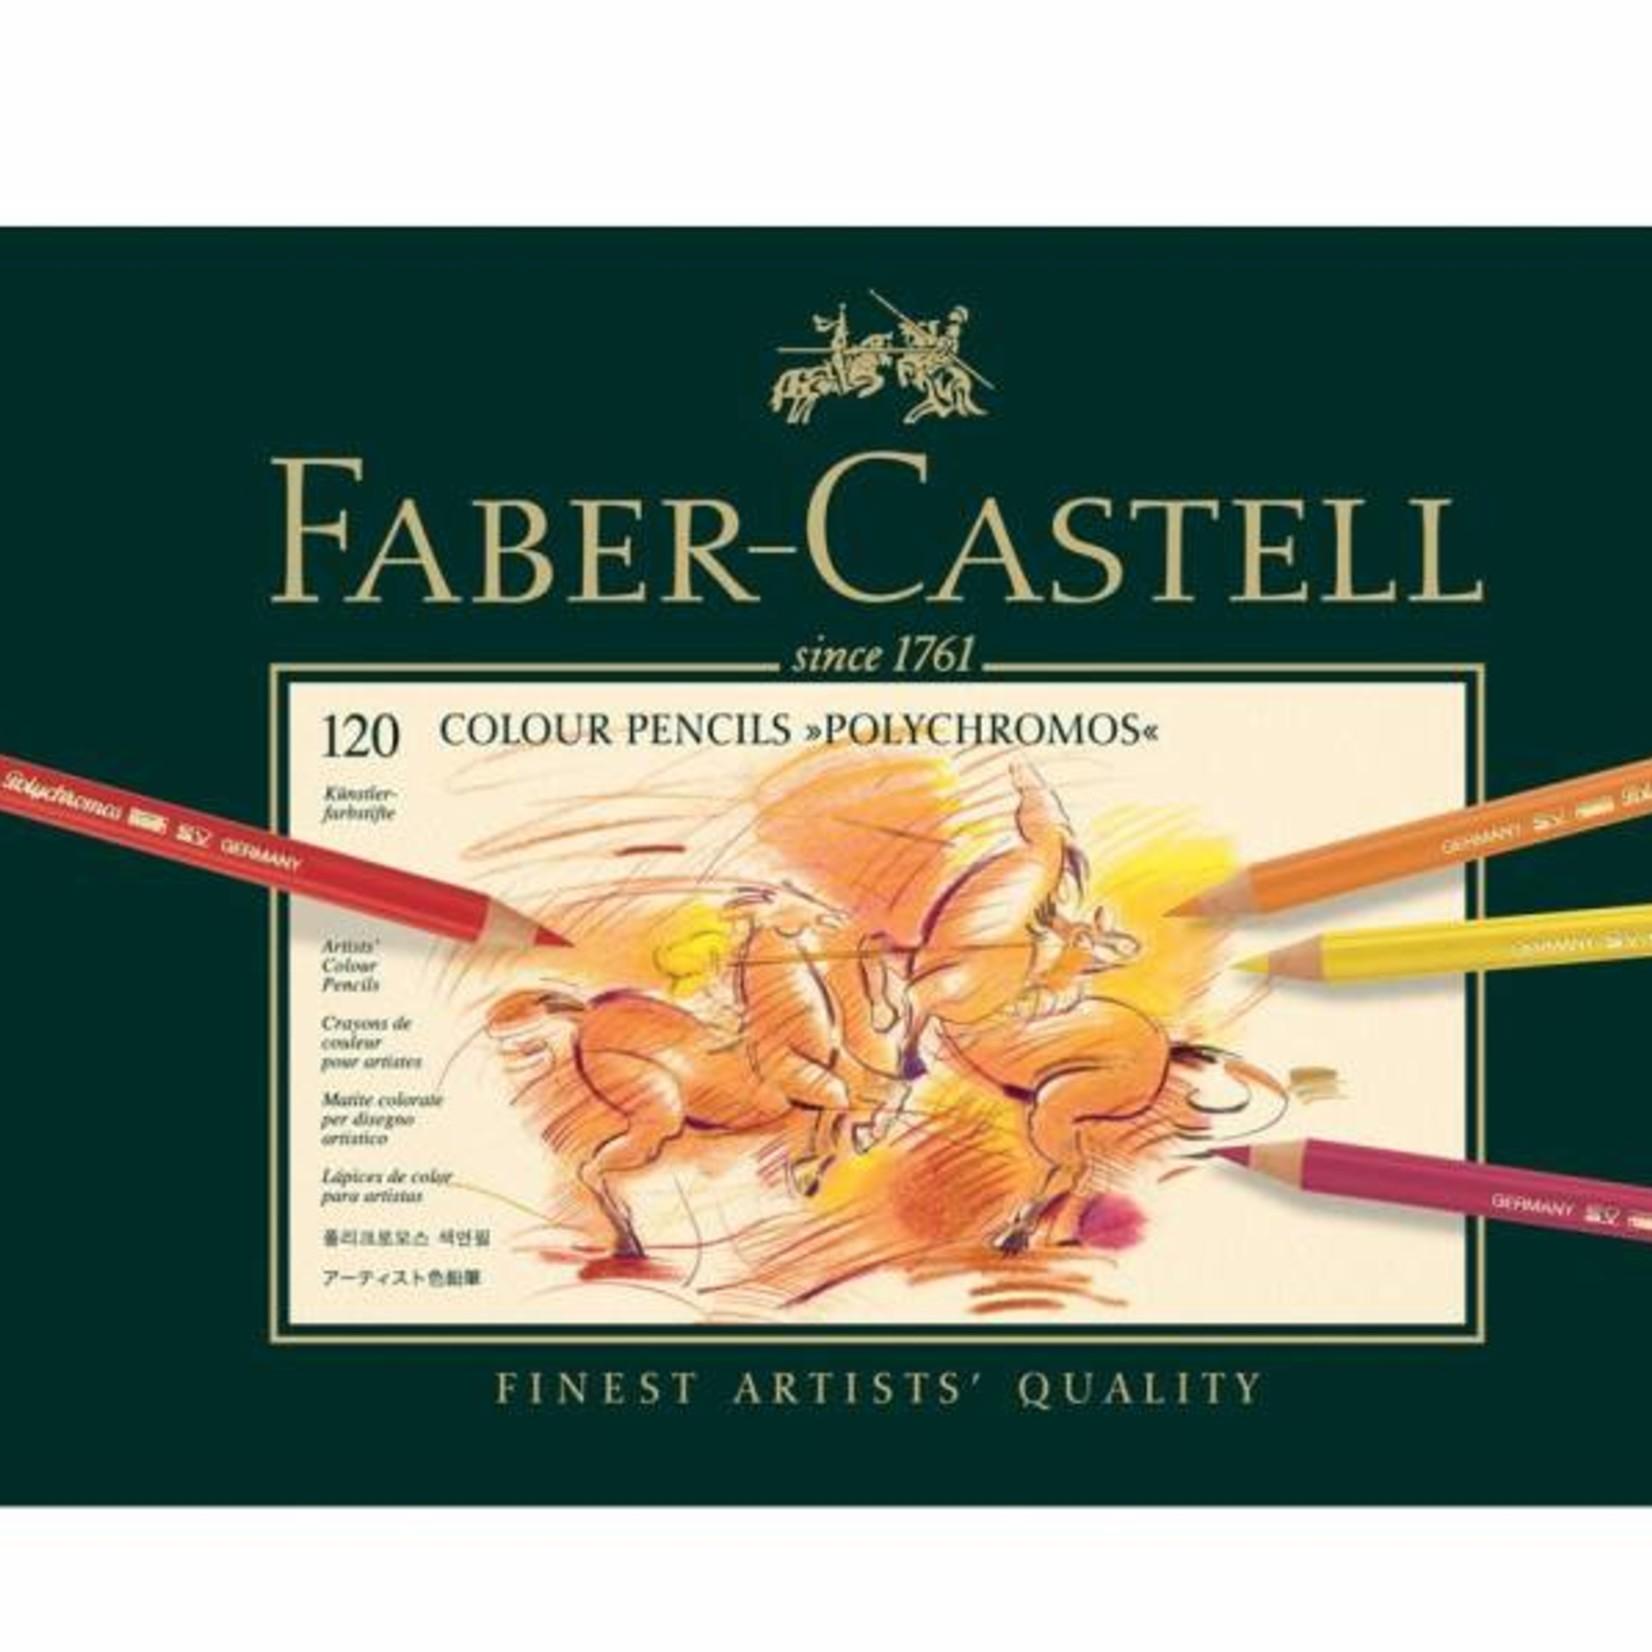 Faber-Castell Faber Castell Polychromos 120Stk in Metallbox